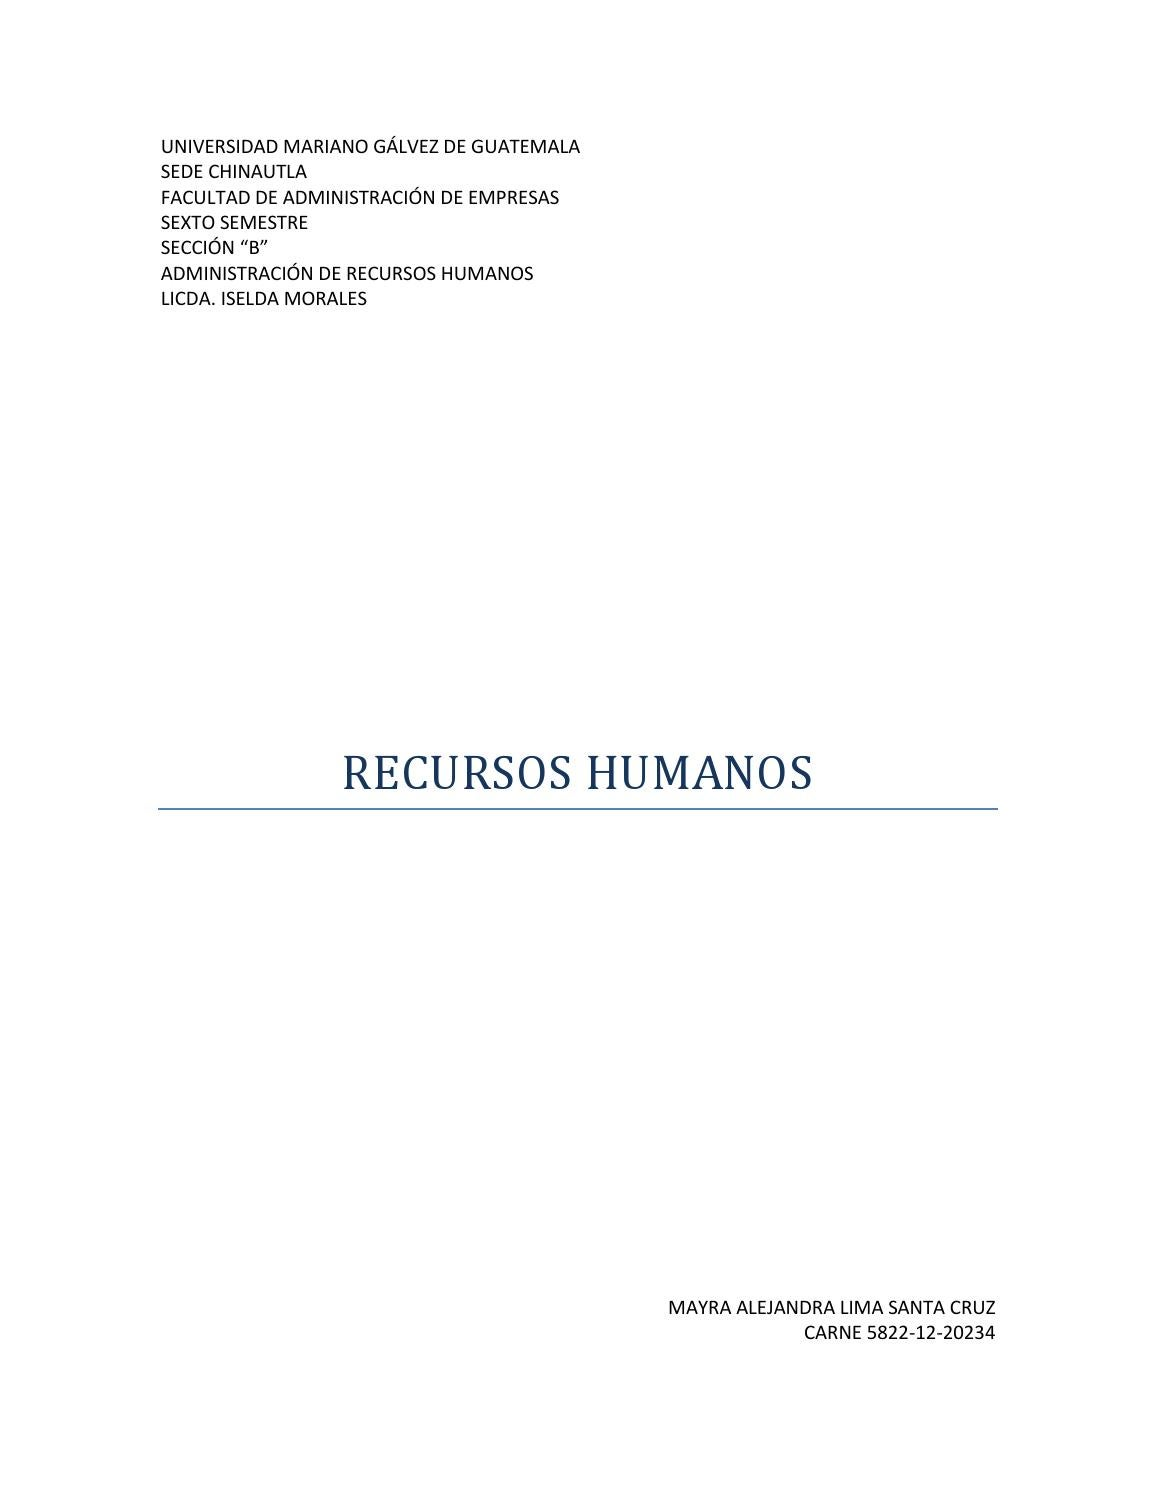 Recursos Humanos by Mayra - issuu